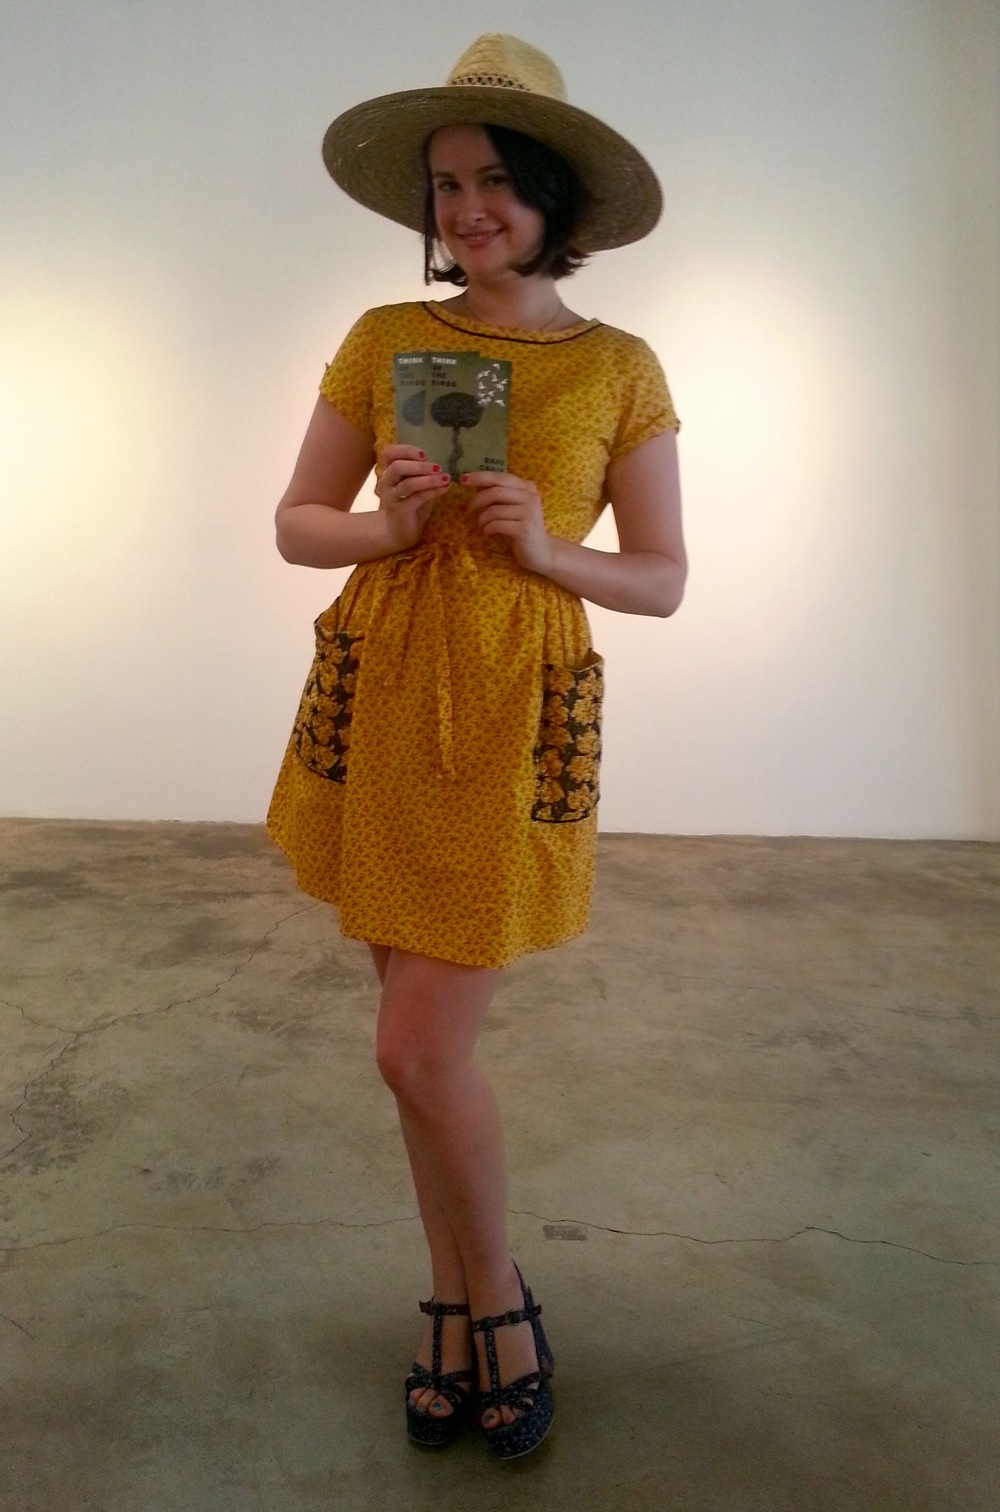 Kelsey Shell, Gallery Associate, ROSEGALLERY